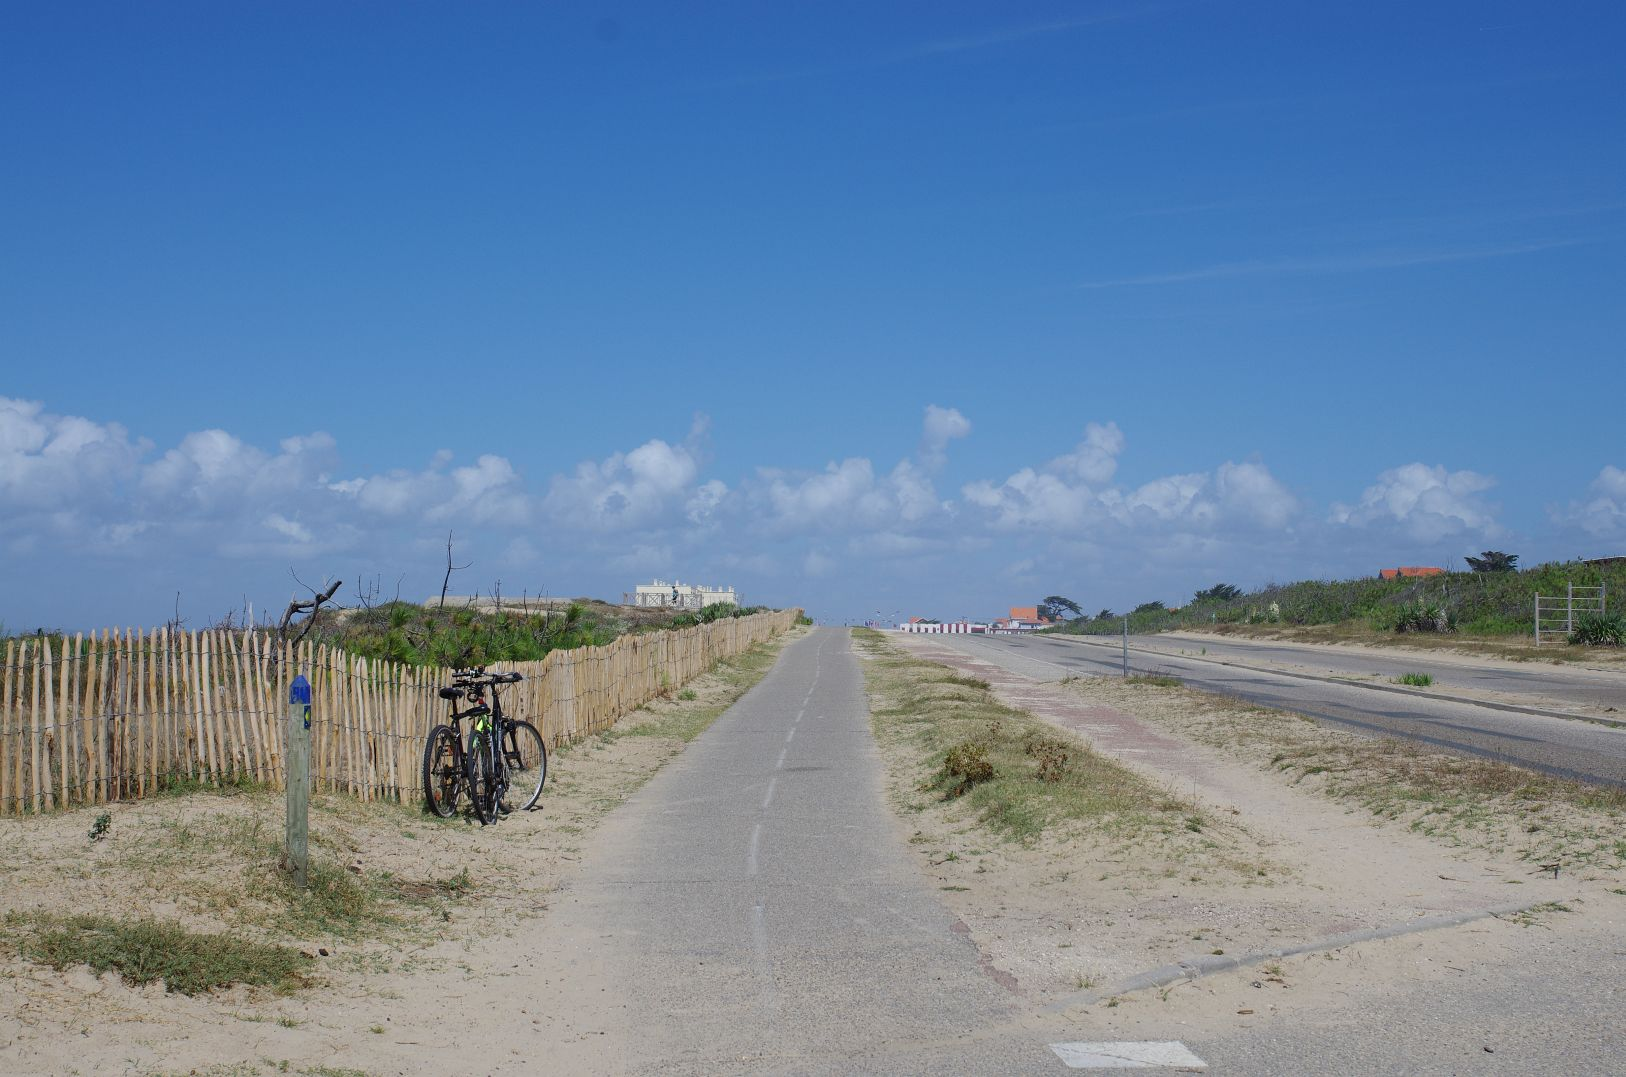 auch das ist der Radweg: am Strand entlang